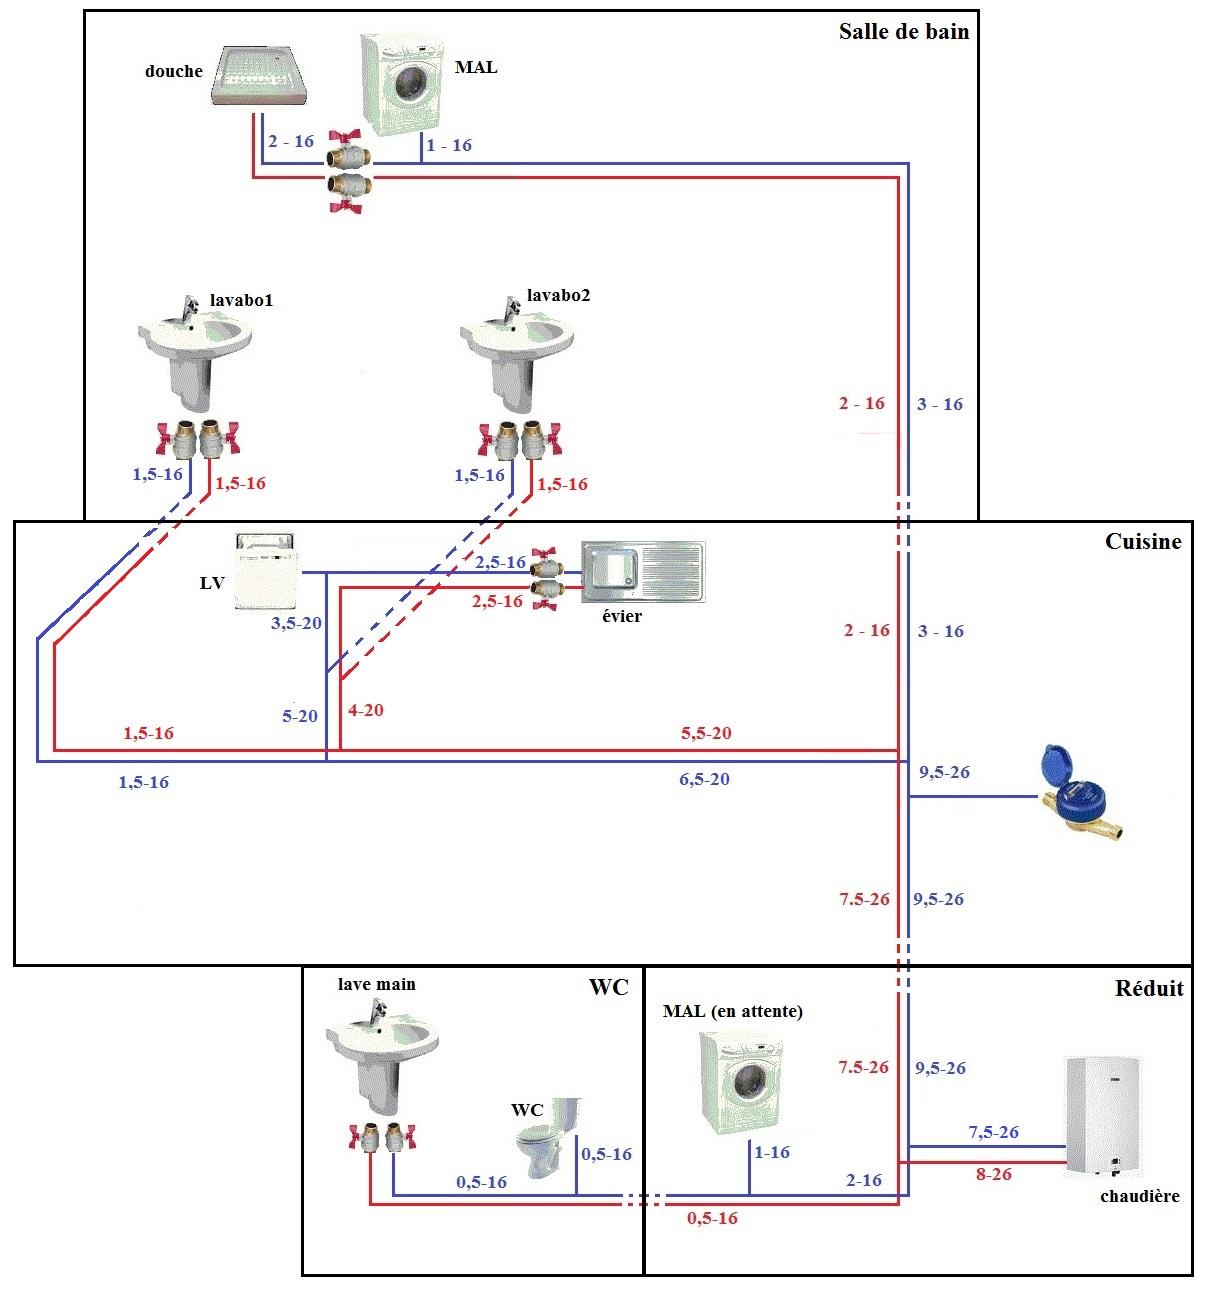 plan_sanitaire3.jpg, 199.79 kb, 1210 x 1294